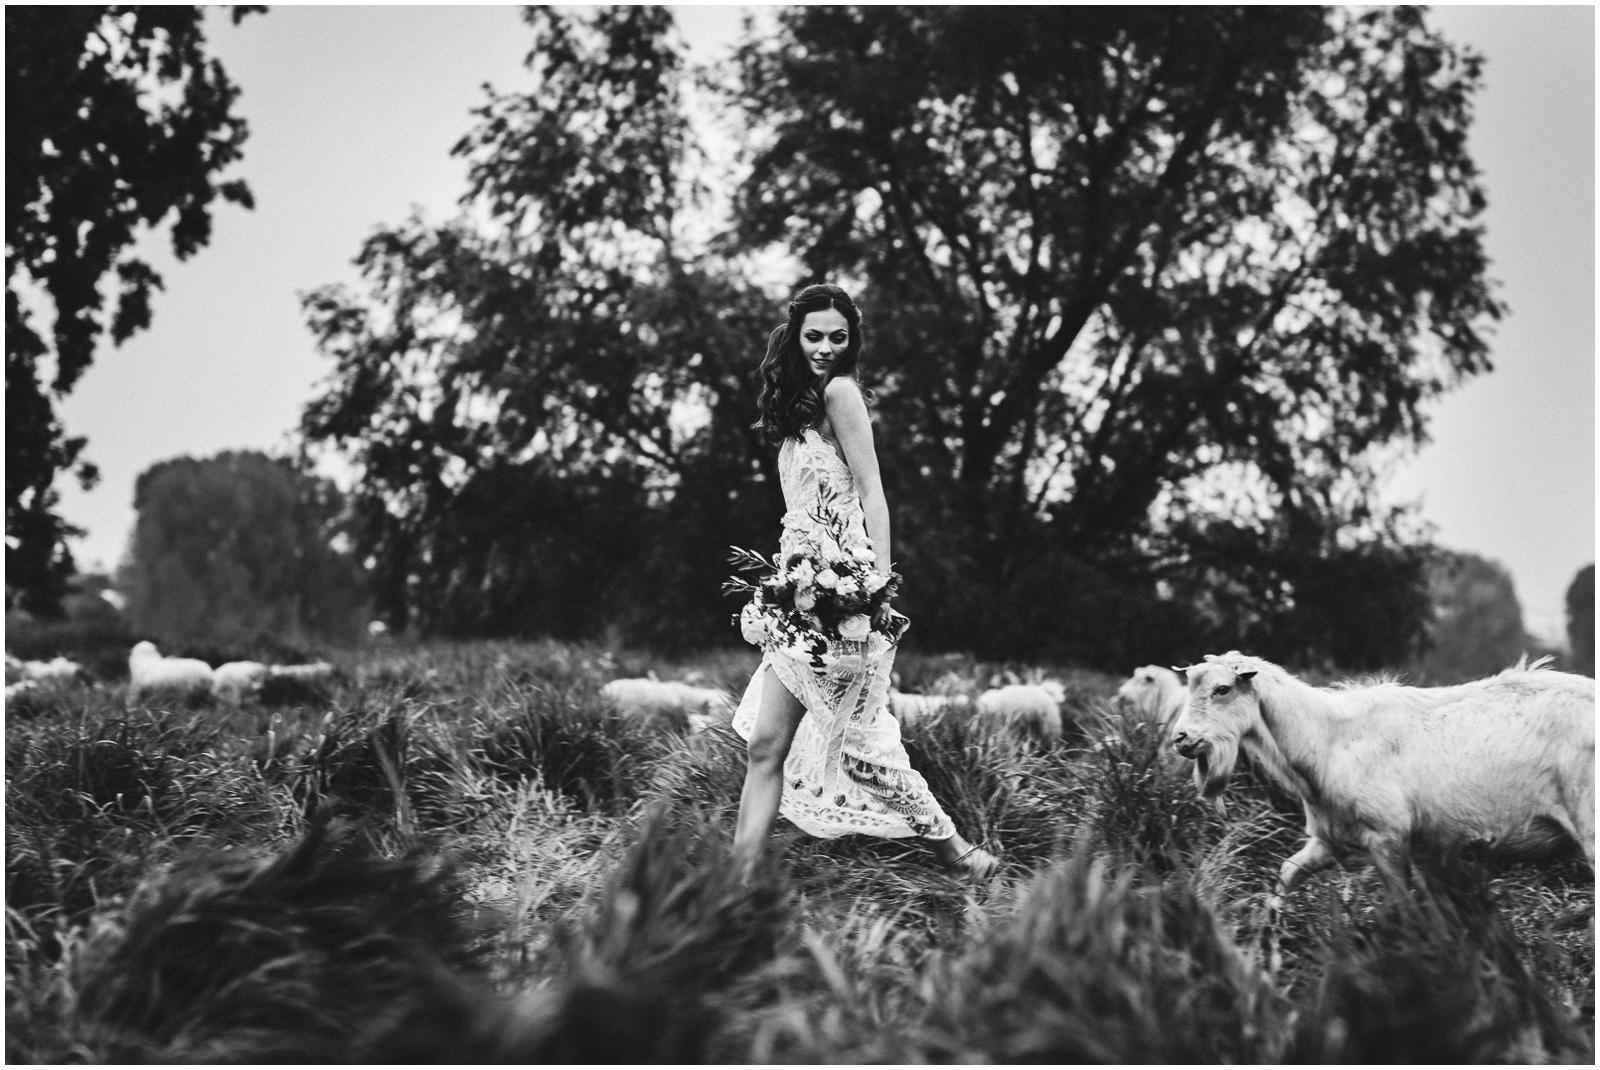 LE HAI LINH Photography-Hochzeitsfotograf-Bohohochzeit-_0016.jpg